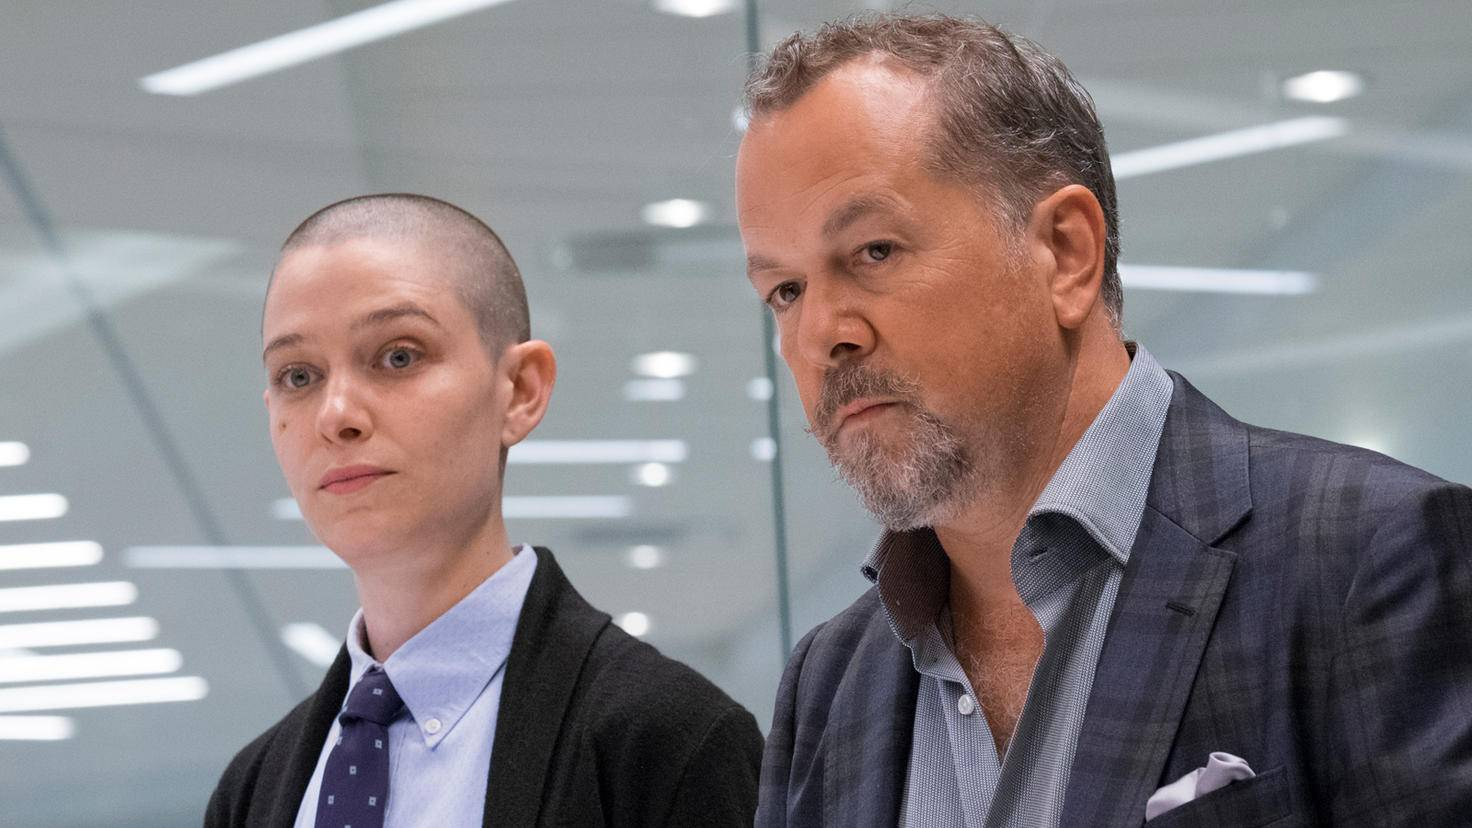 Taylor Mason (Asia Kate Dillon) ist zunächst nur eine Praktikantin bei Axe Capital.